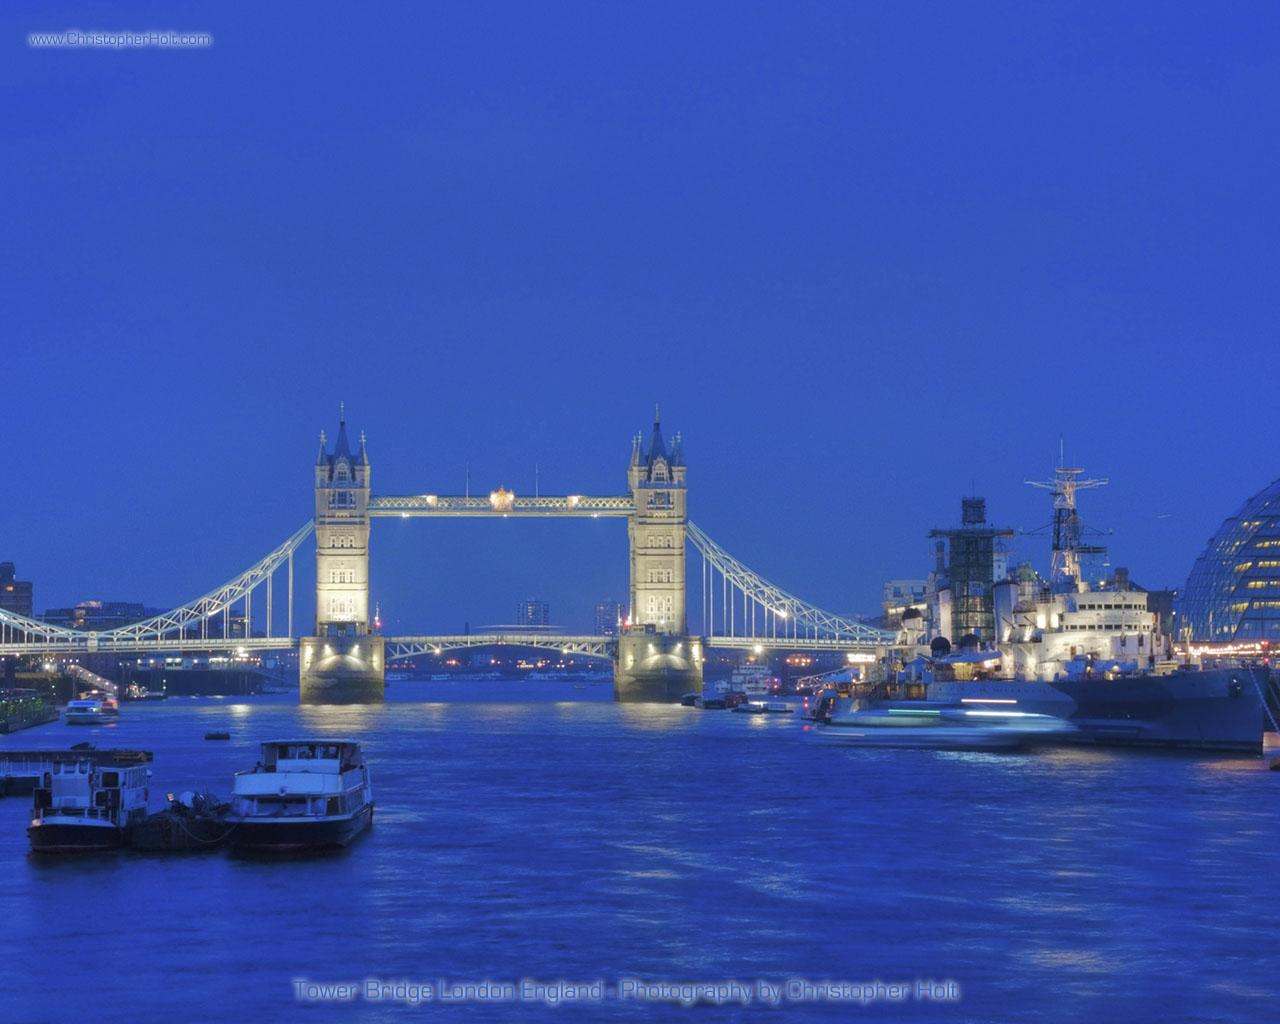 london wallpaper by uk photographer Christopher Holt 1280x1024